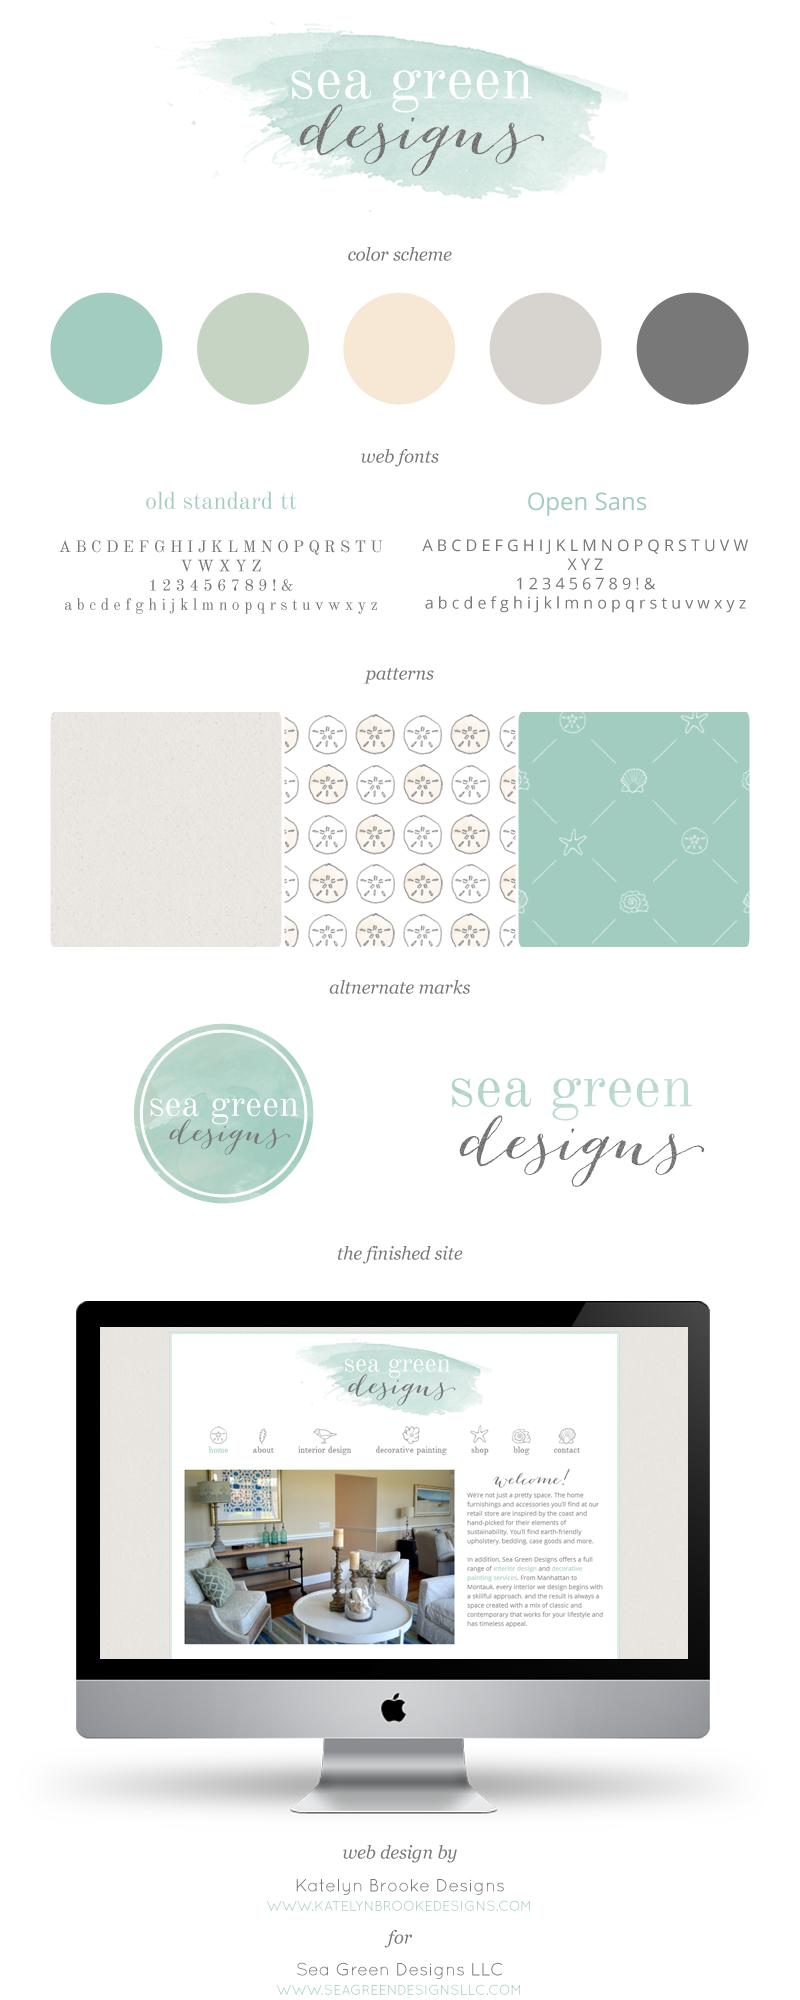 custom branding + web design for Sea Green Designs